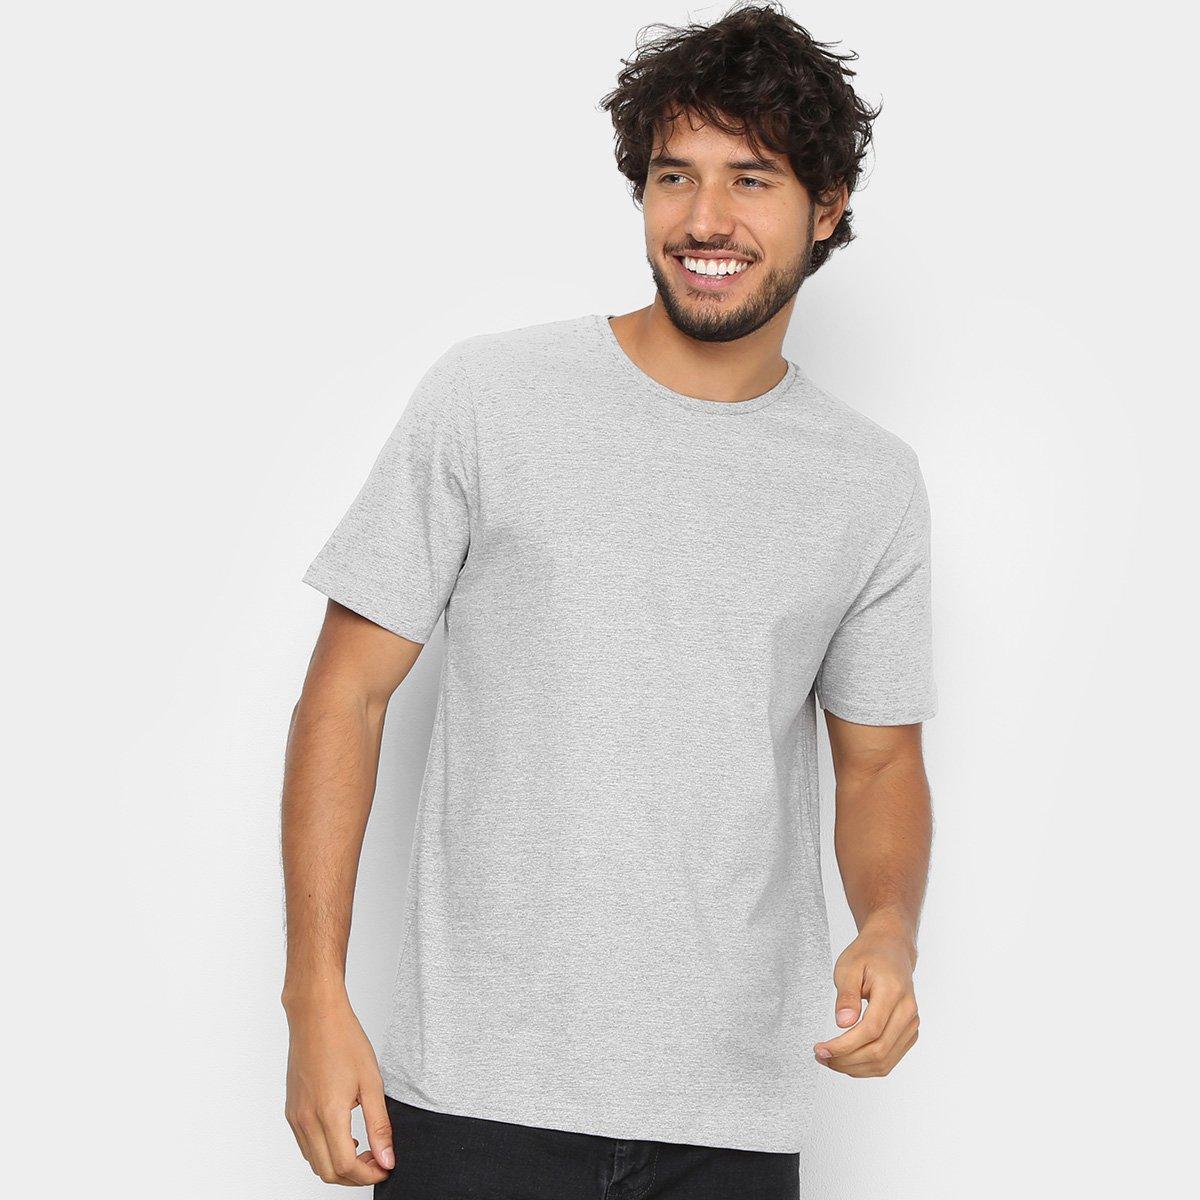 Kit Camiseta Básica c/ 5 Peças Masculinas - Tam: G - 4